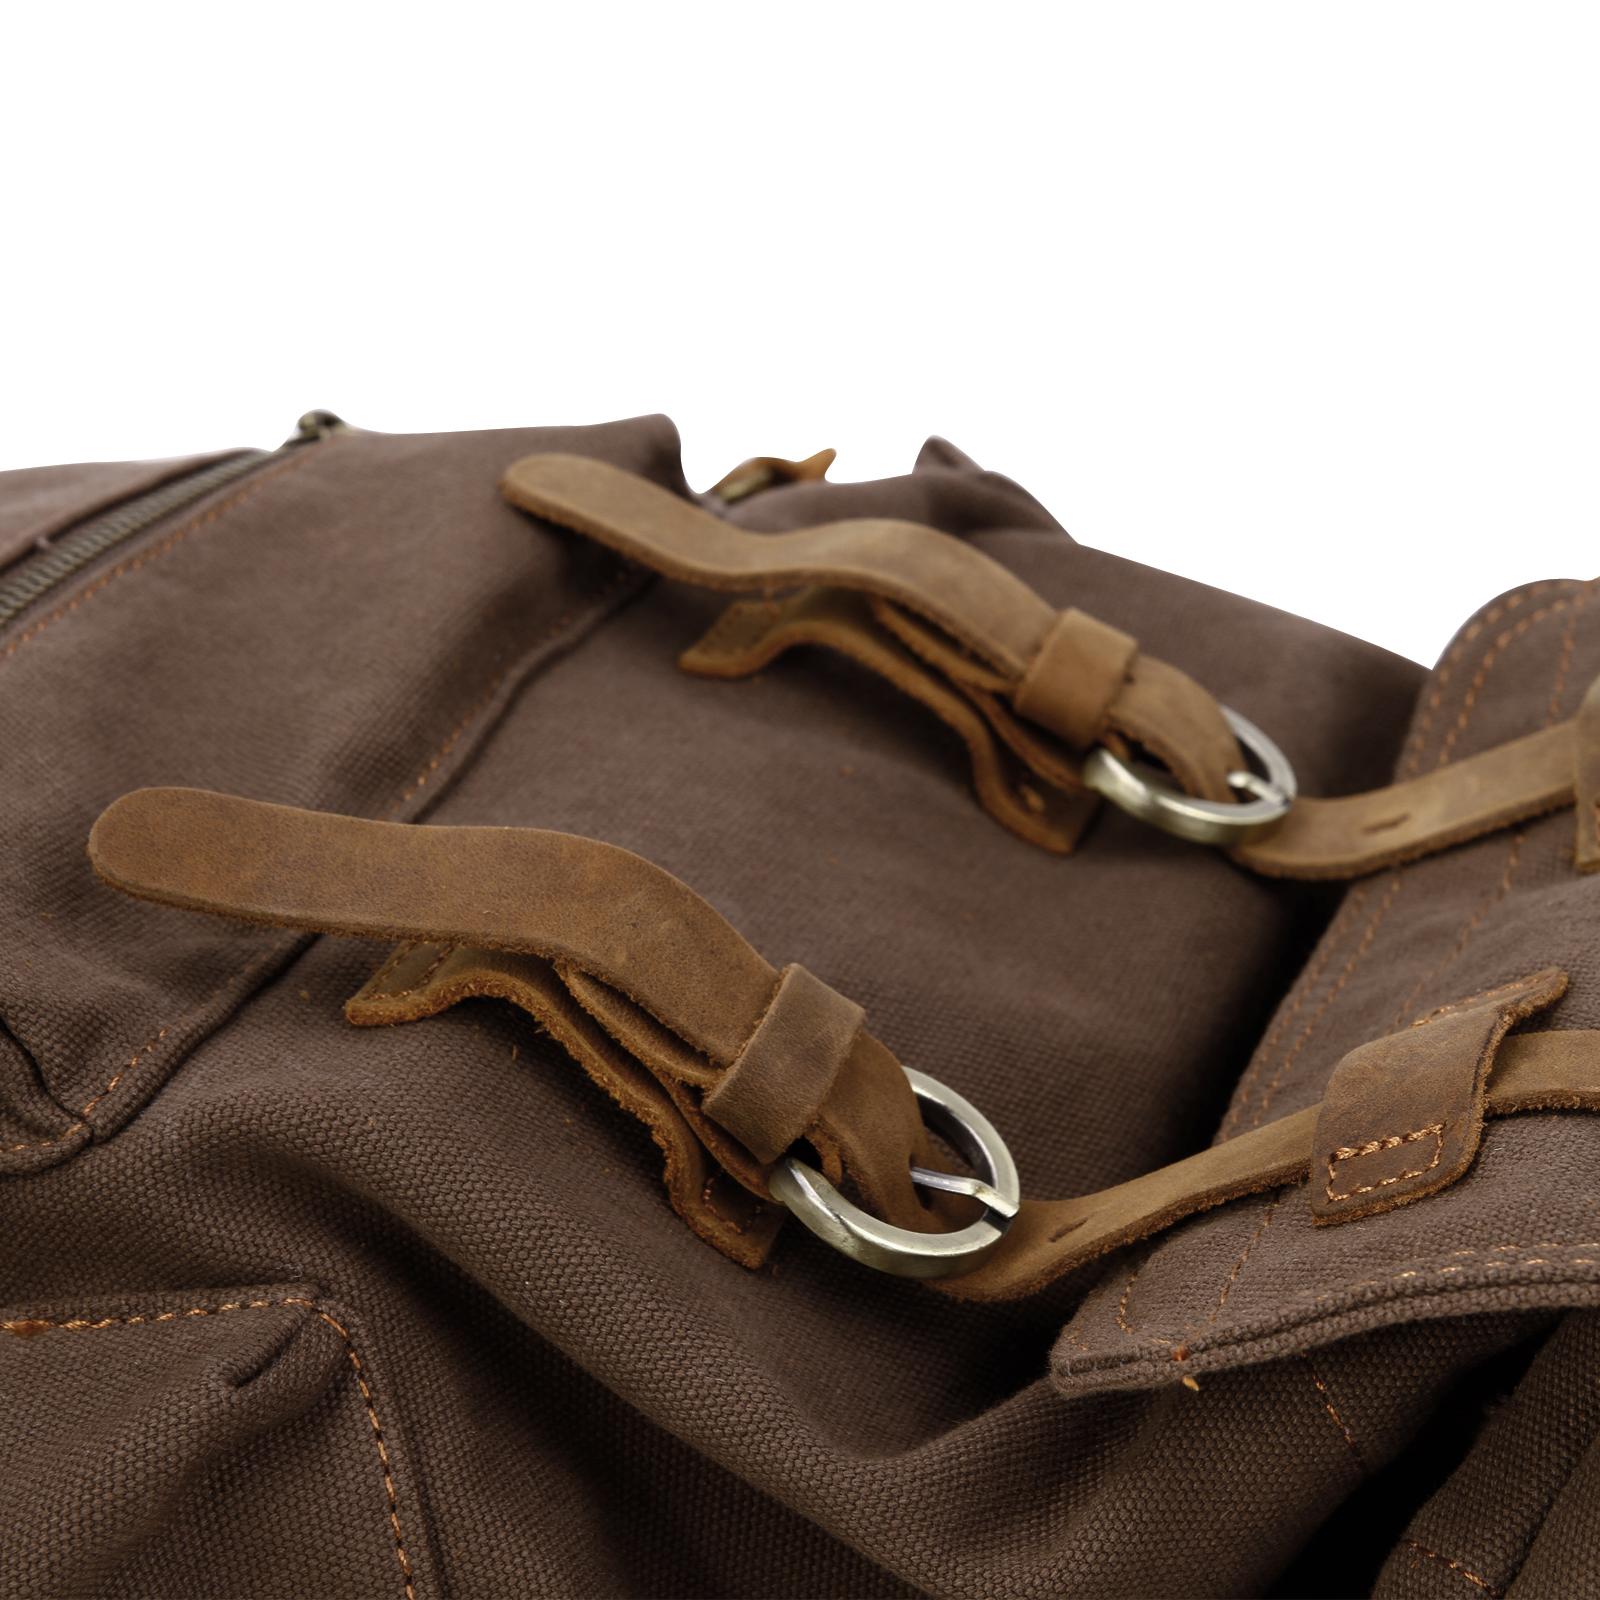 sac dos hommes femme toile vintage randonn e voyage cartable militaire 20l ebay. Black Bedroom Furniture Sets. Home Design Ideas